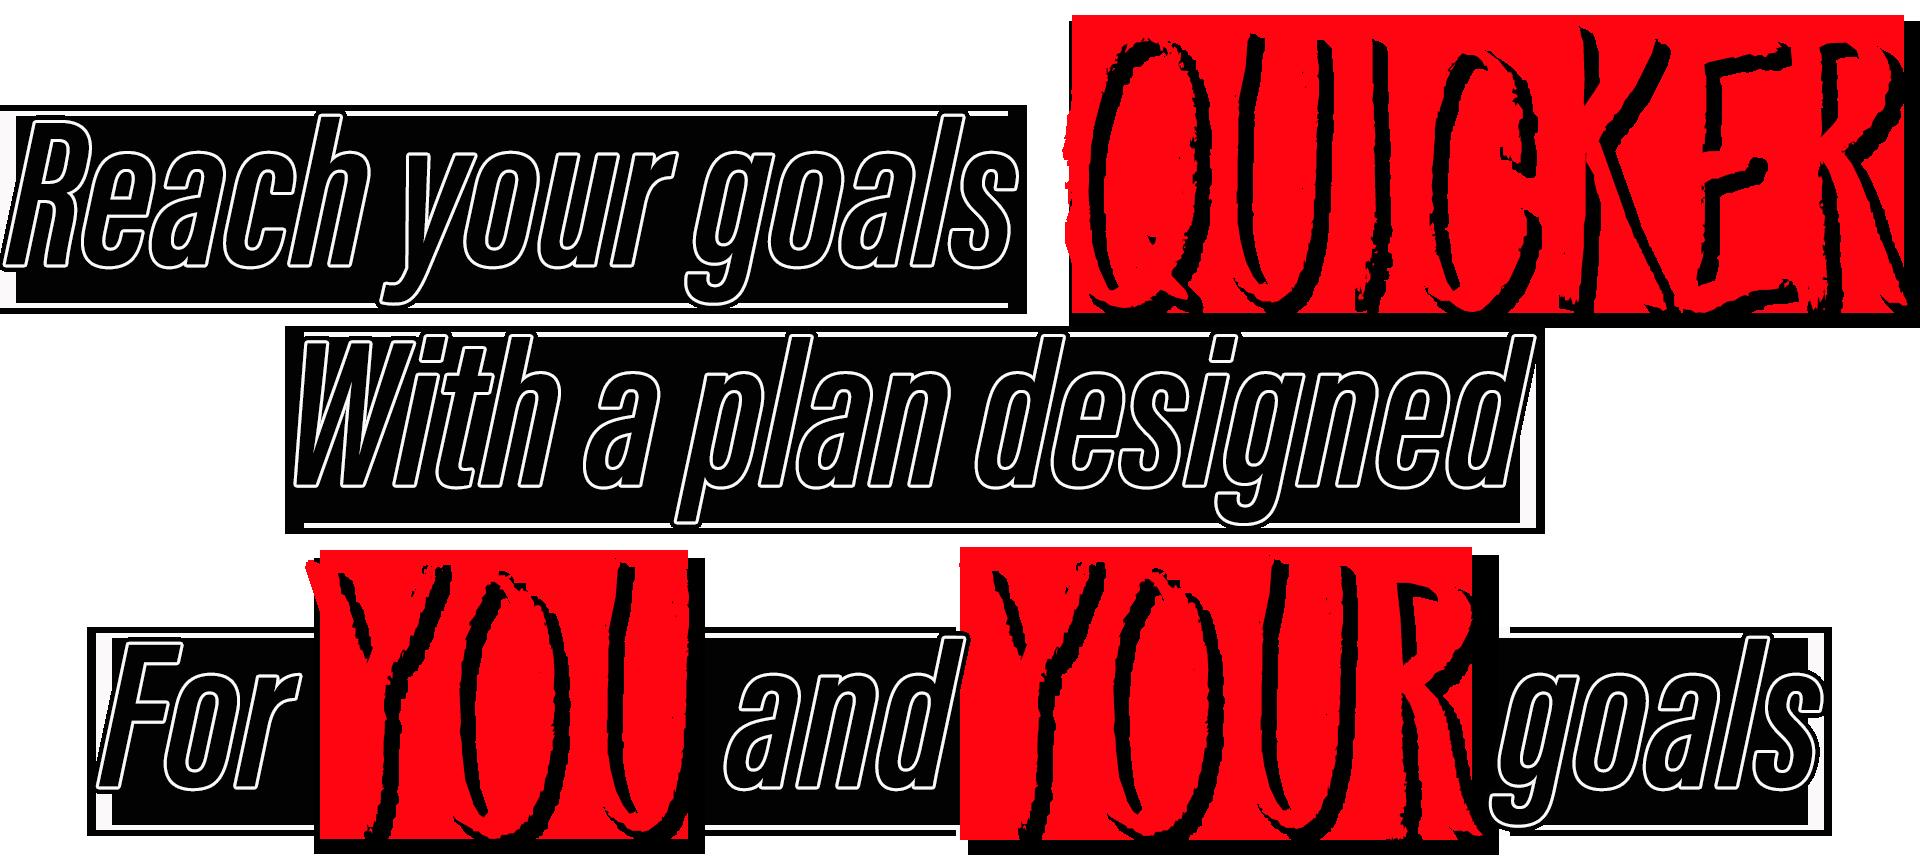 Reach your goals quicker text.png